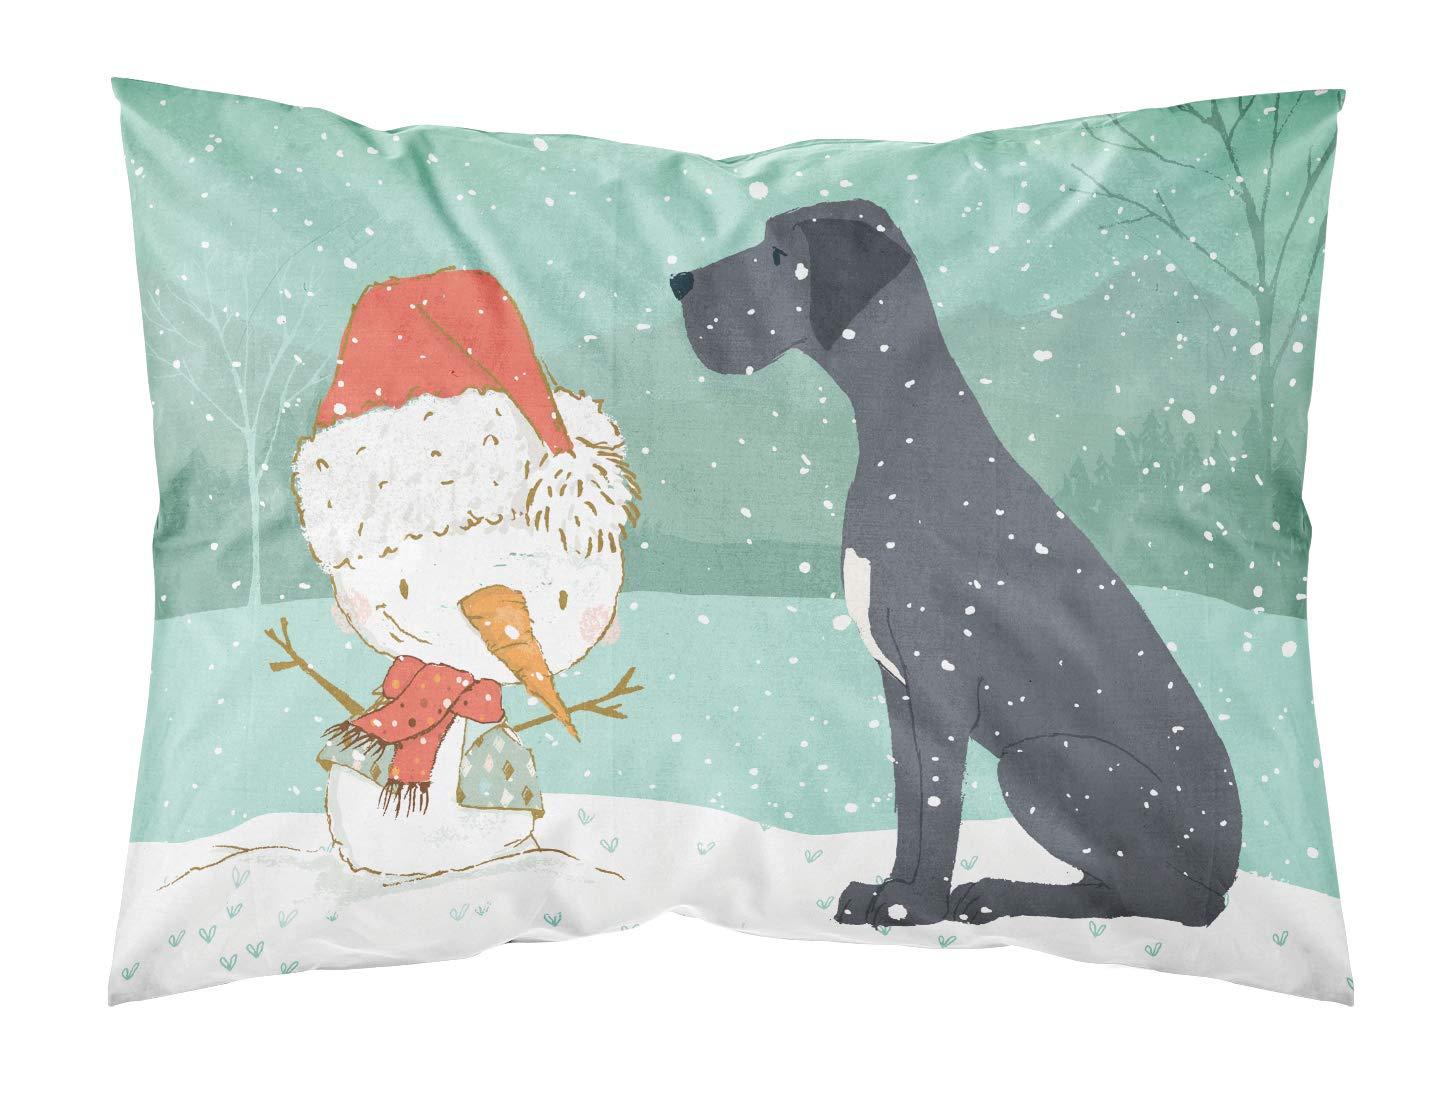 Carolines Treasures Cropped Fawn Dane Snowman Christmas Fabric Standard Pillowcase,